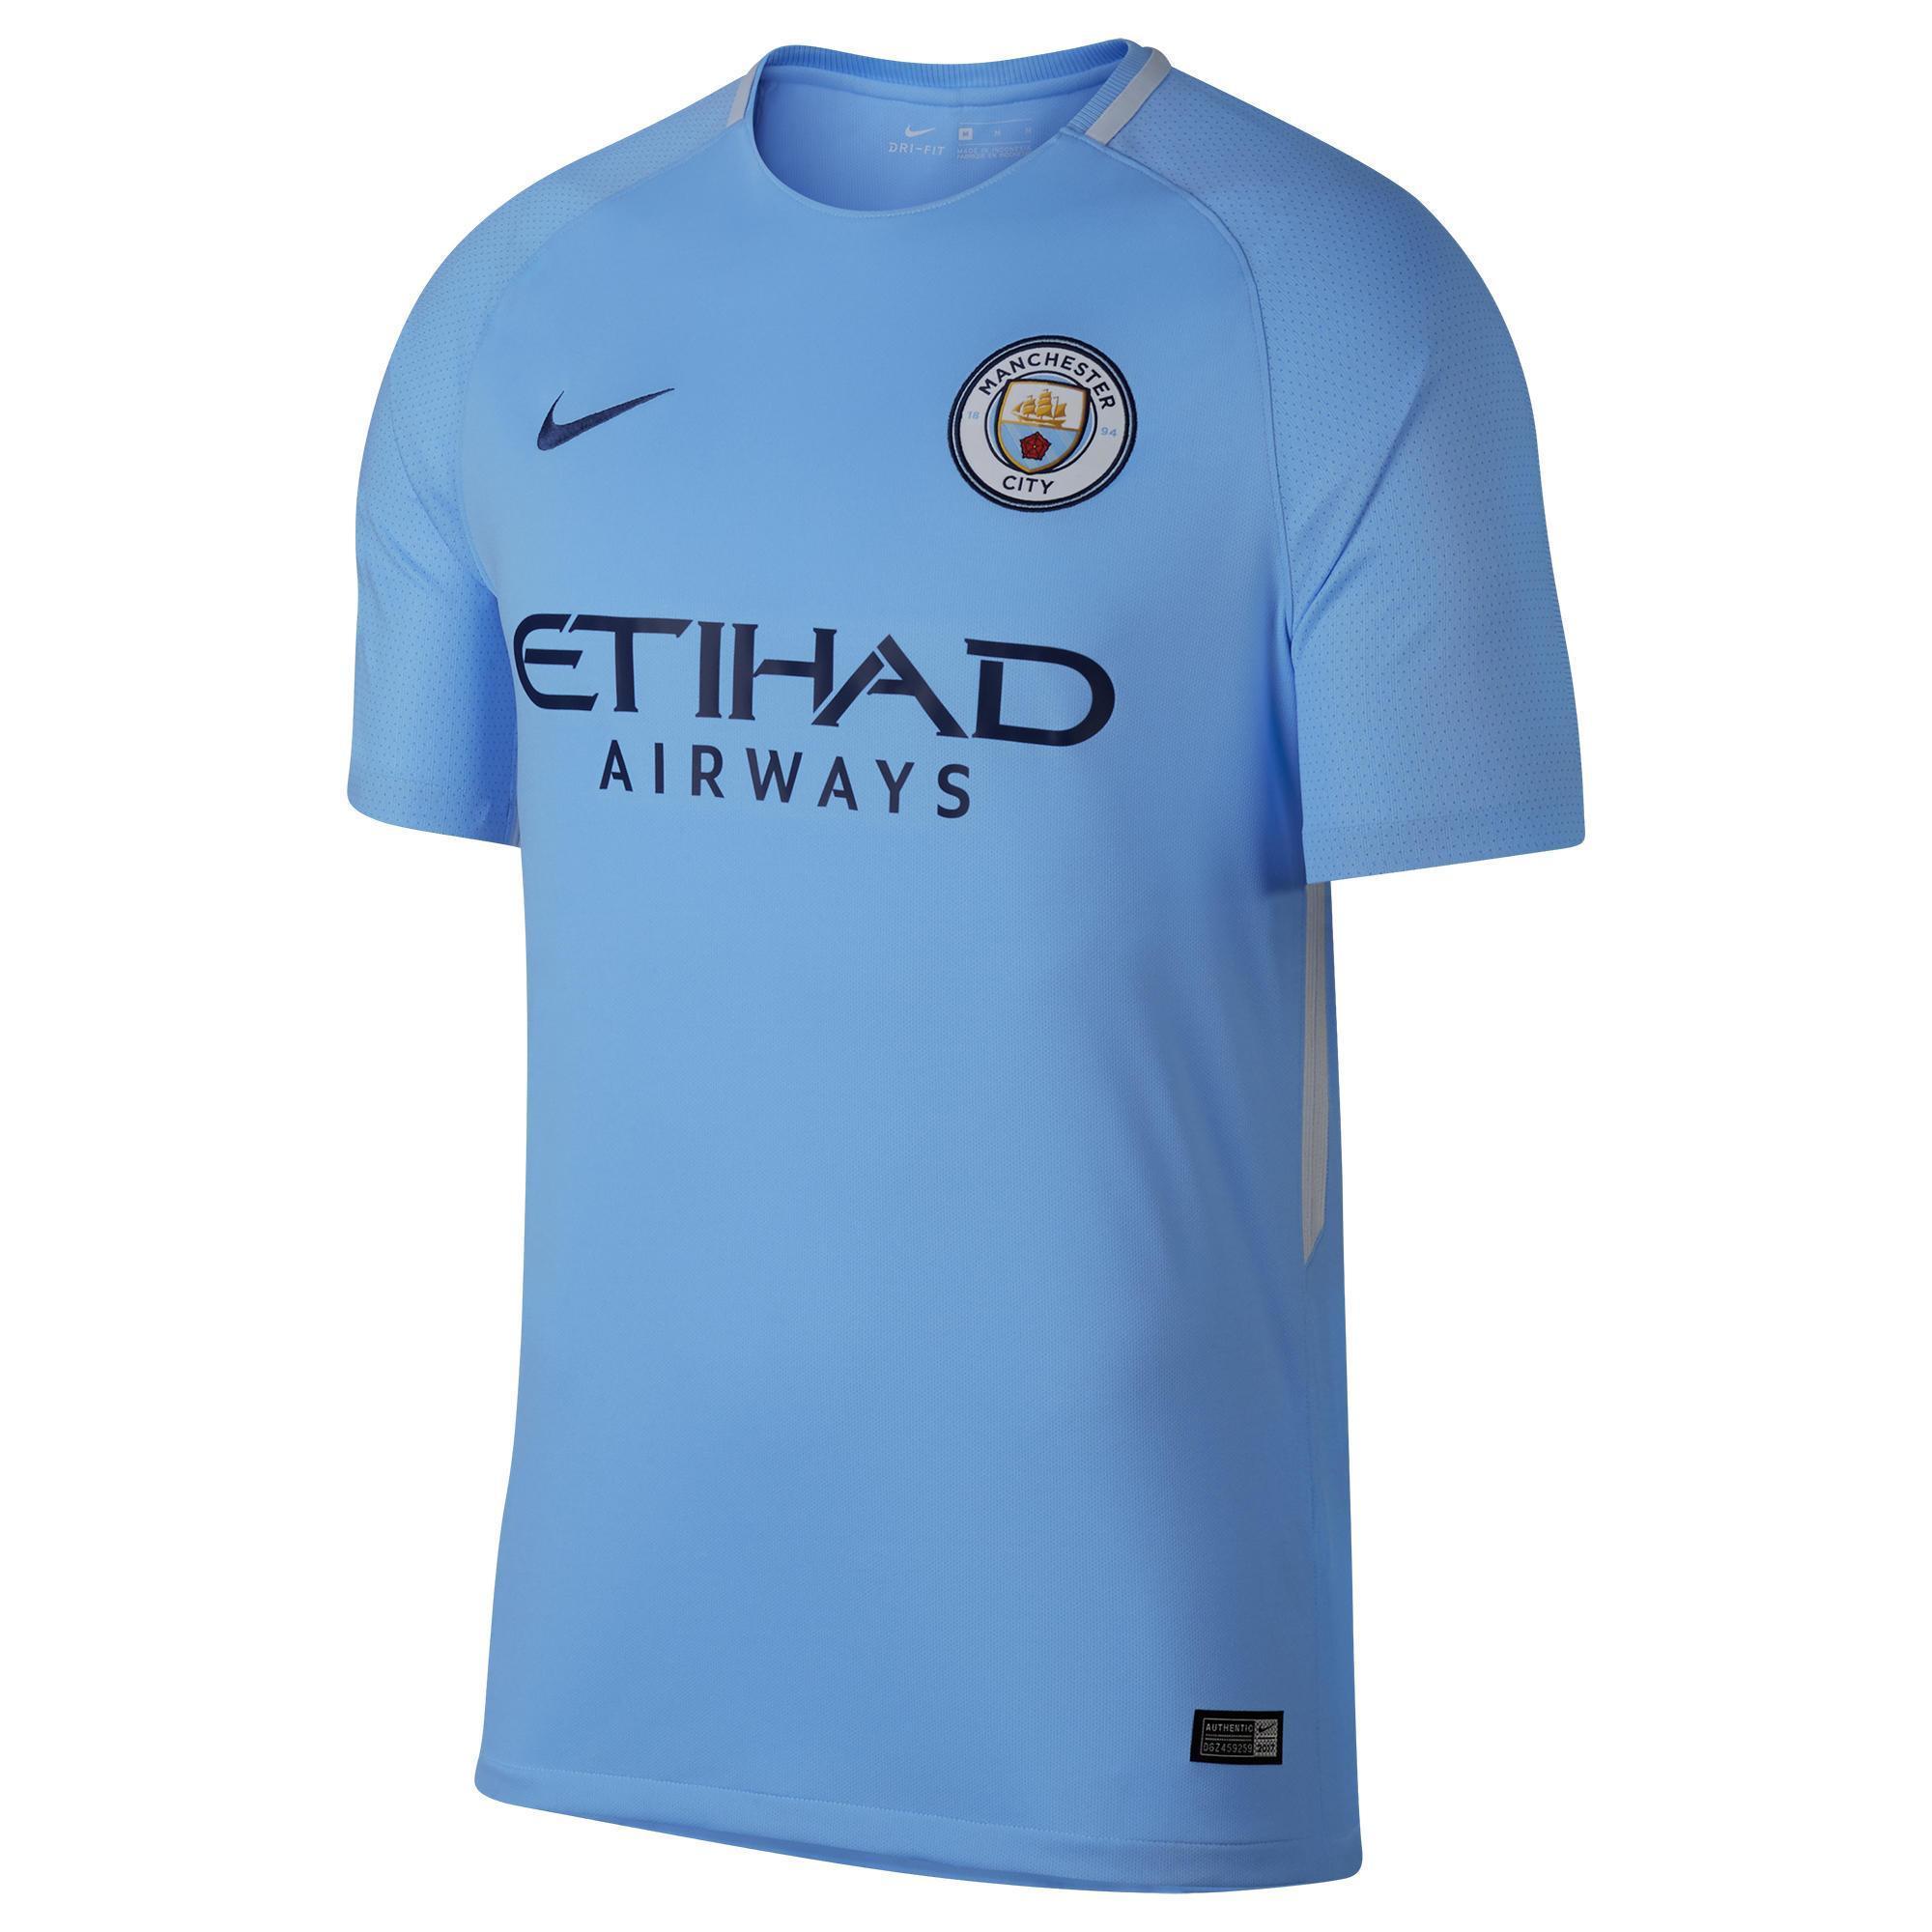 bfca01bfeec Manchester City & Chelsea fanshop kopen? | Decathlon.nl